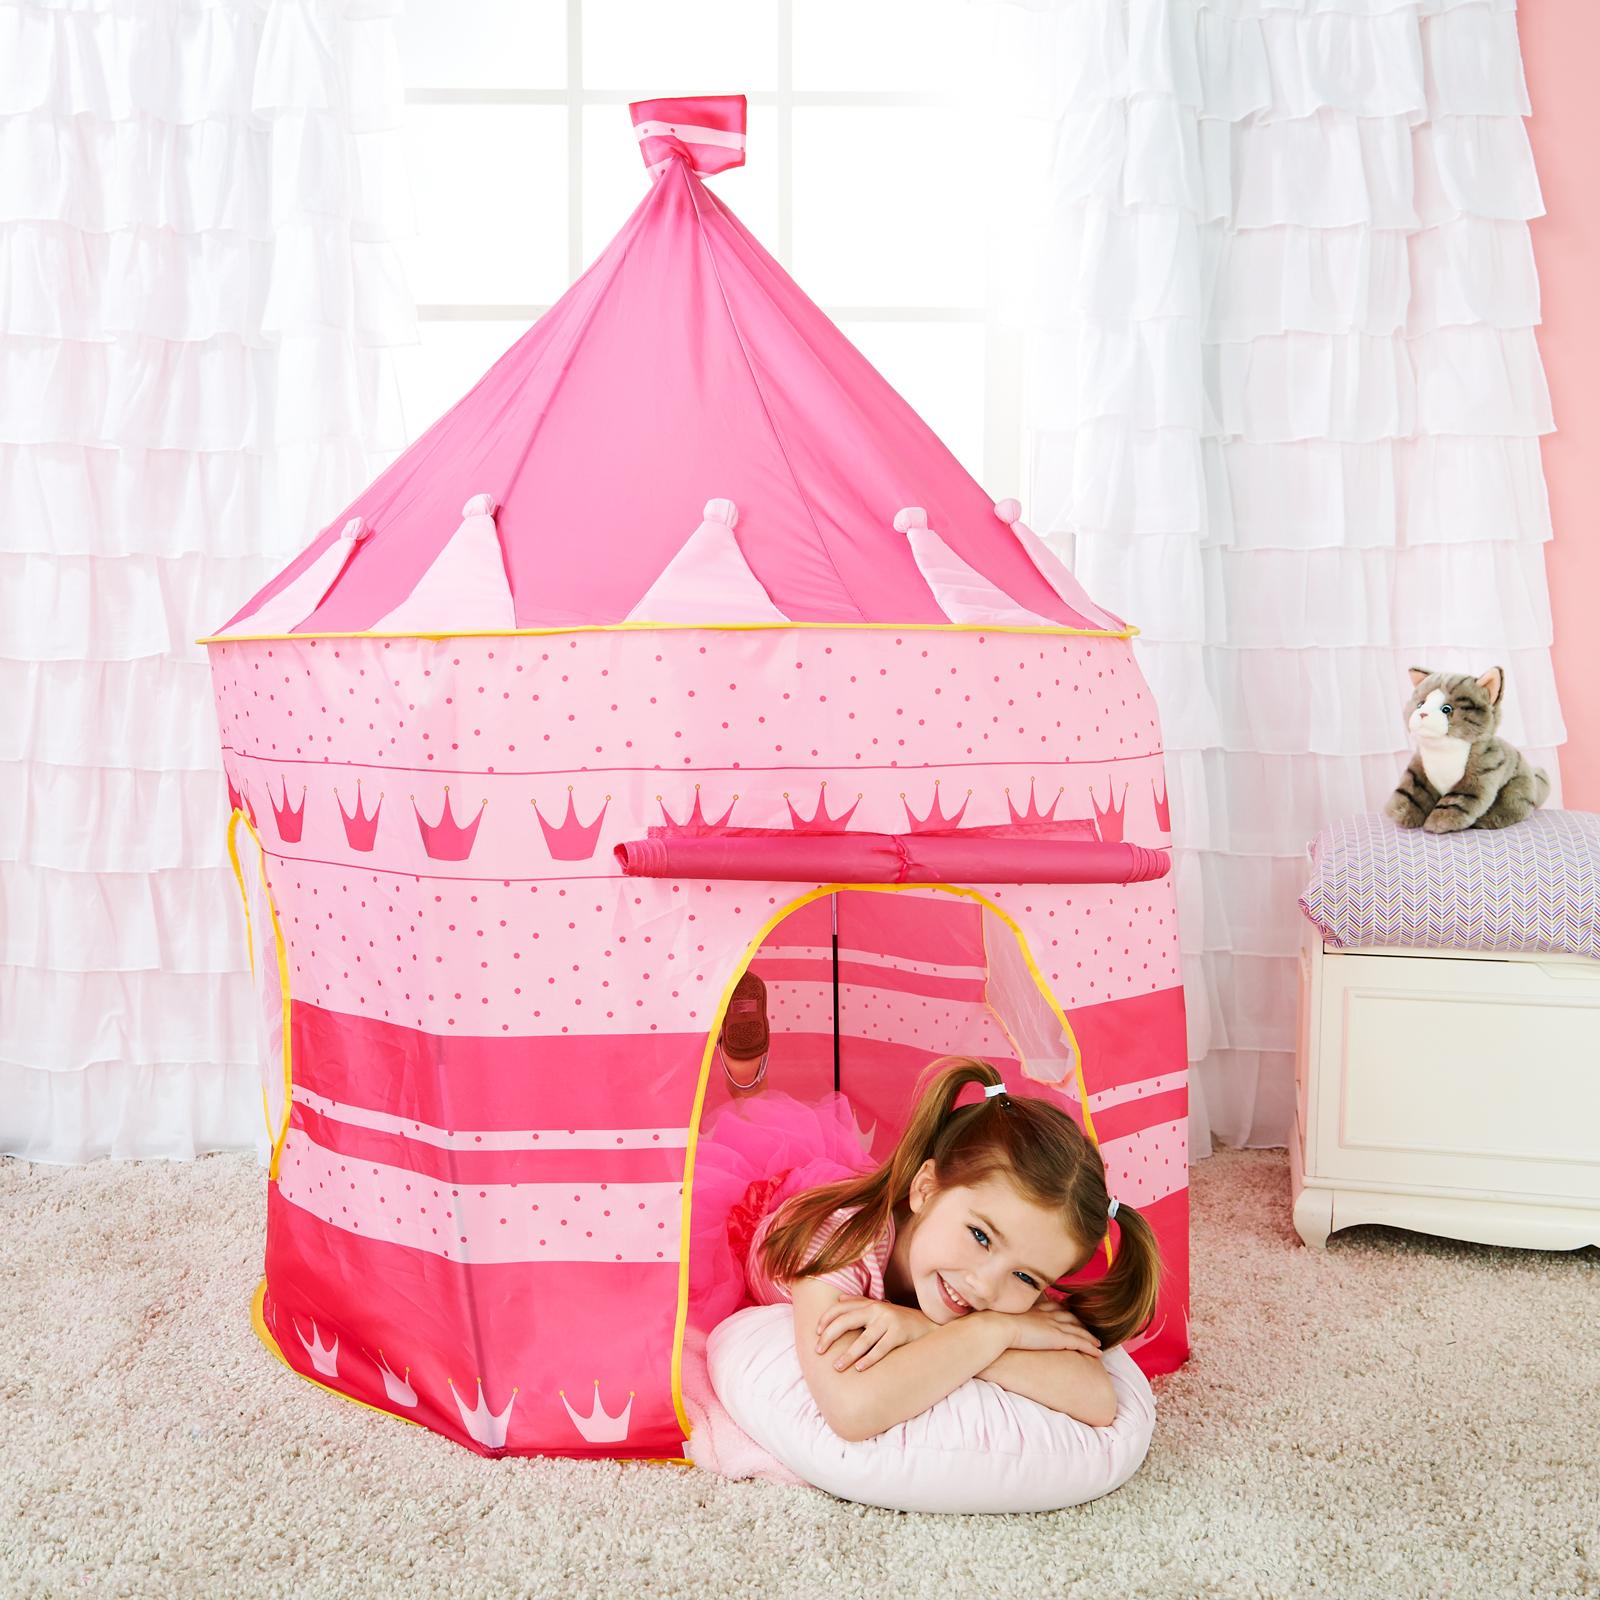 Default Image - Princess Tent & Princess Tent   BirthdayExpress.com